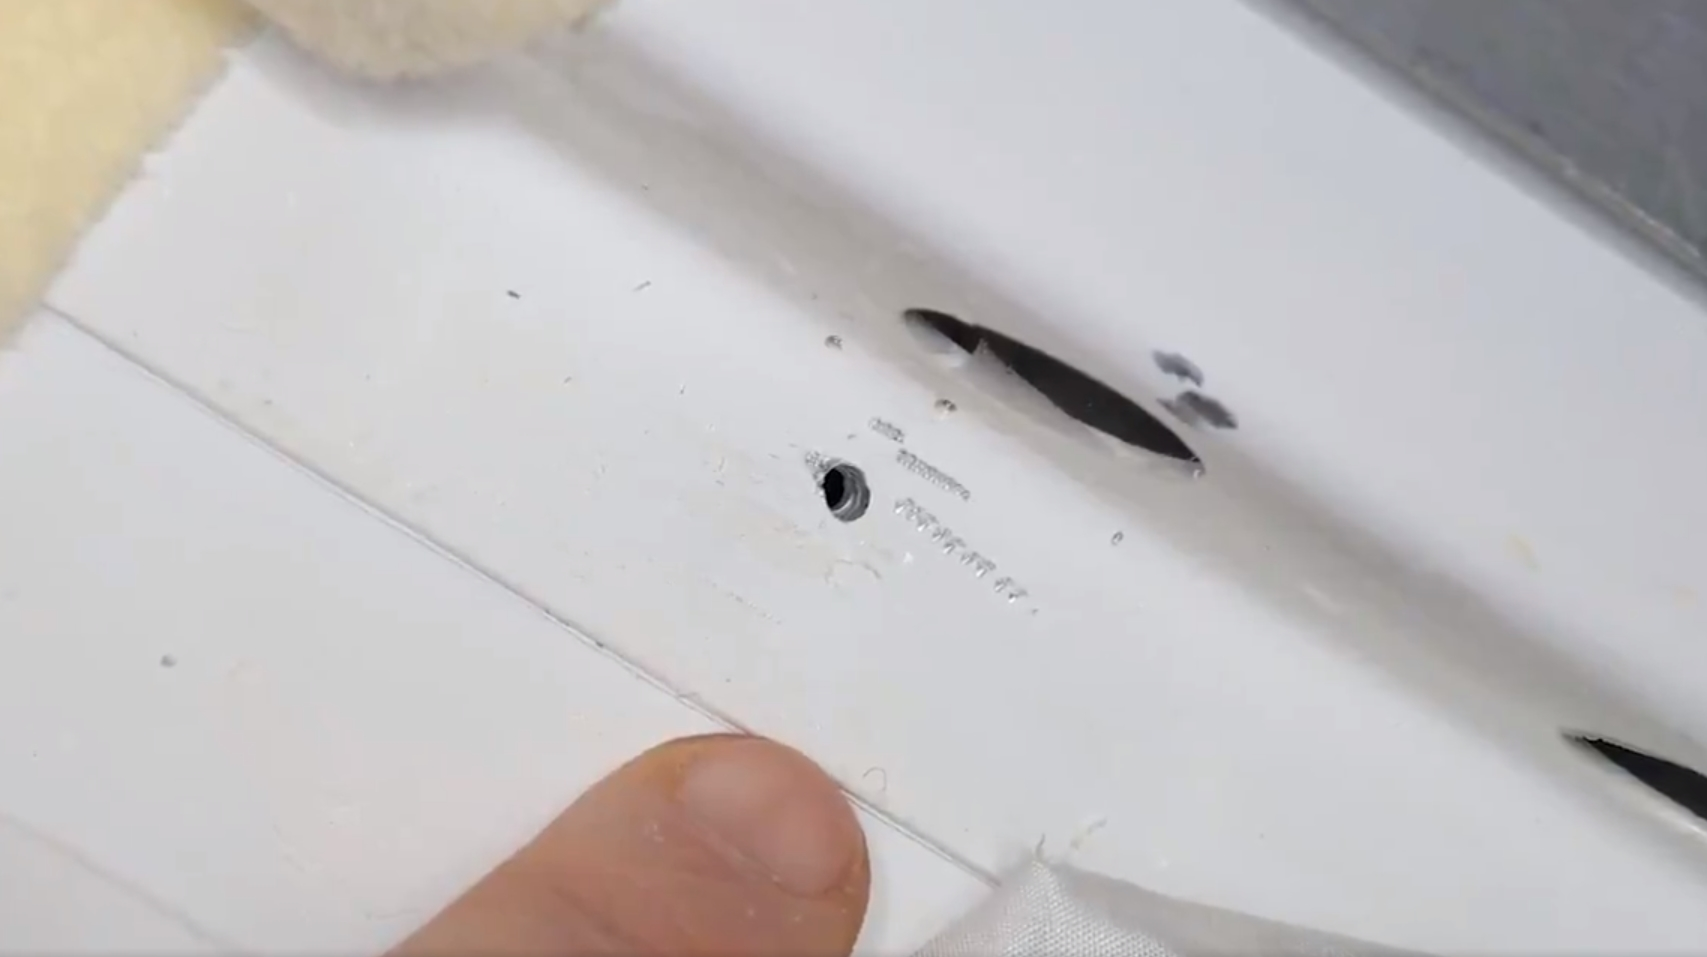 Soyuz/Station atmosphere leak no threat to Crew - Investigation